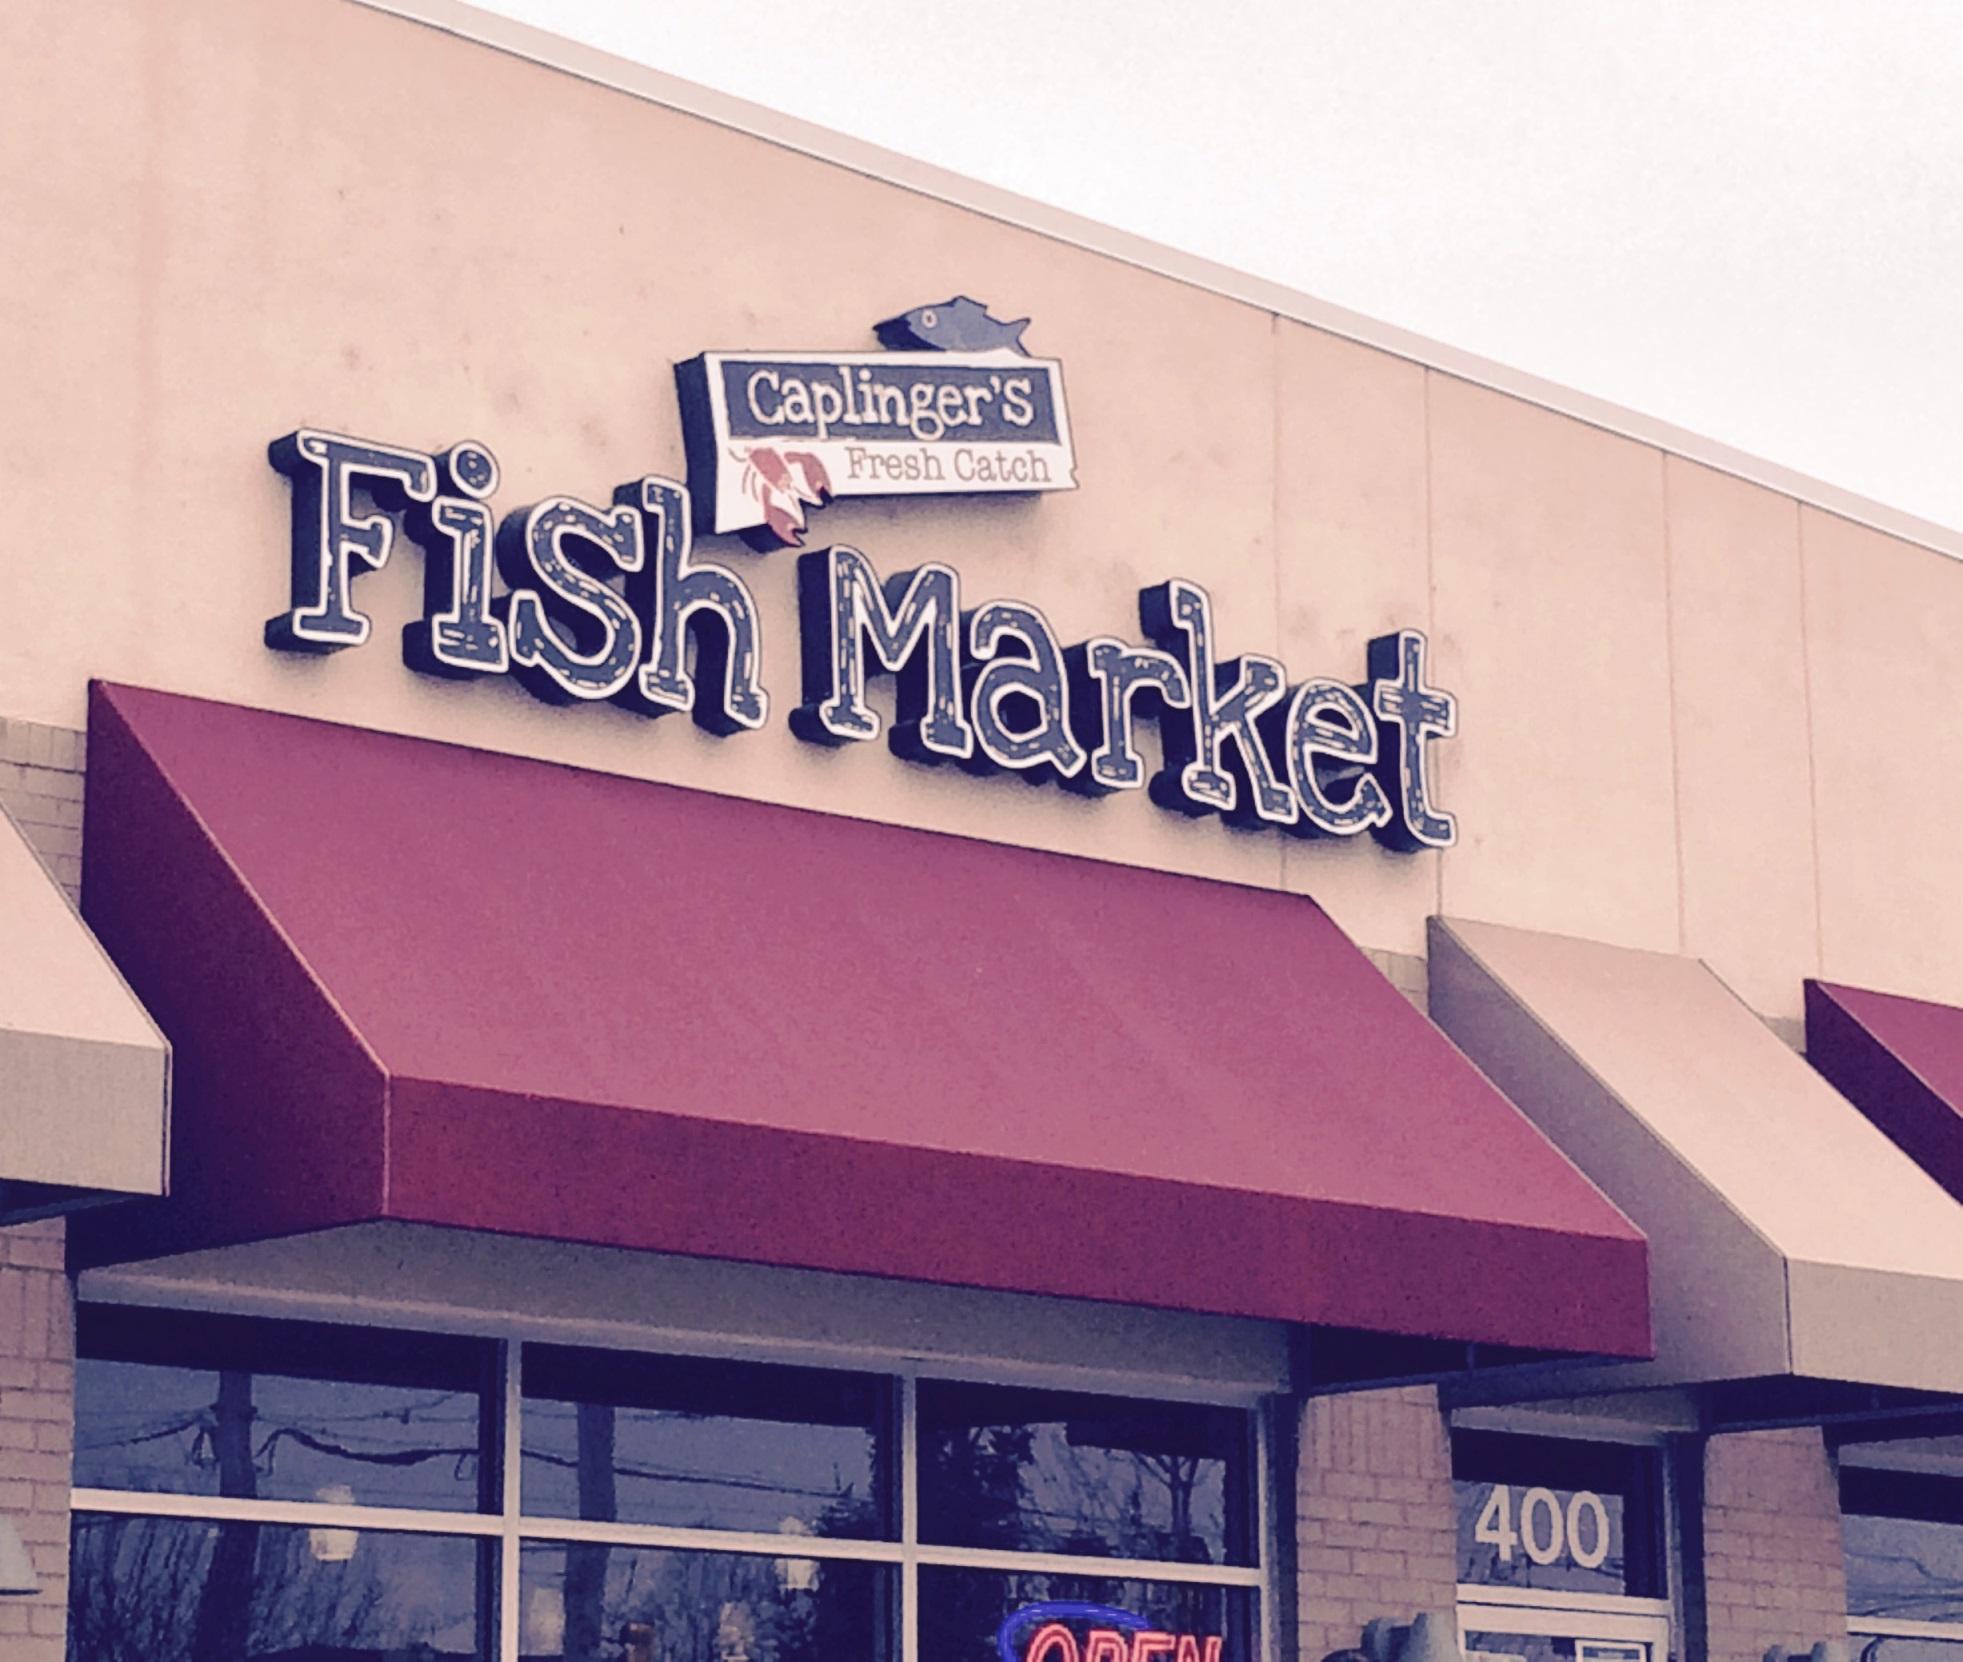 Caplinger's Fresh Catch Seafood Market